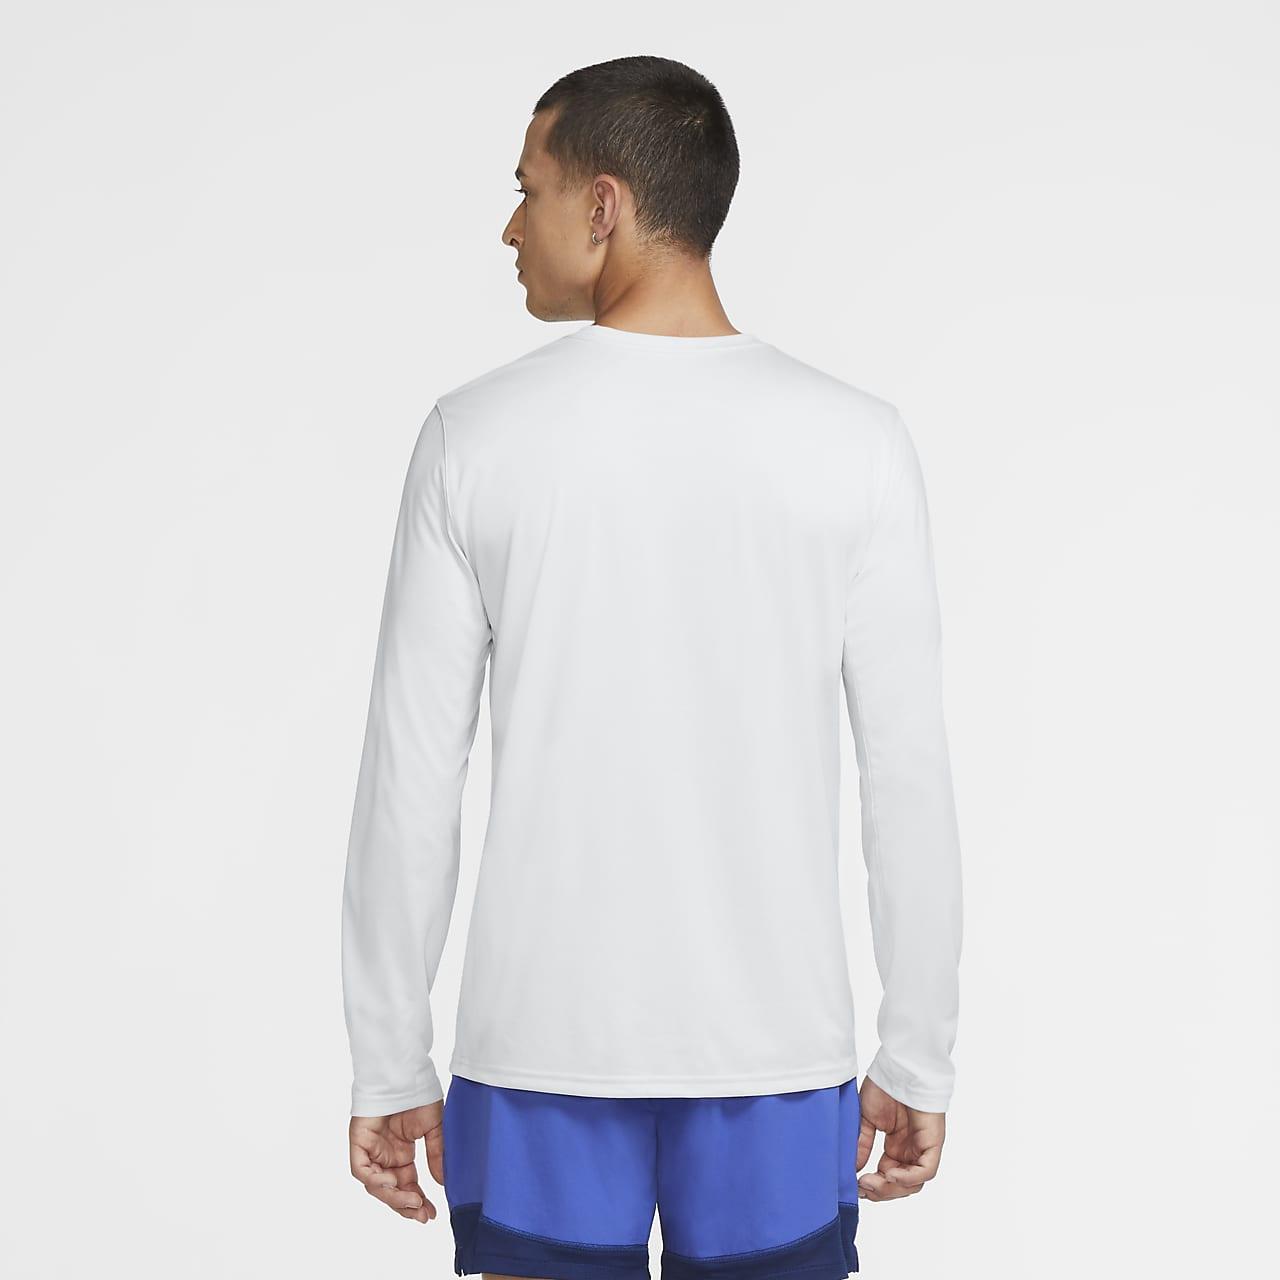 89fa9c8d1 Nike Dri-FIT Legend 2.0 Men's Long-Sleeve Training Top. Nike.com